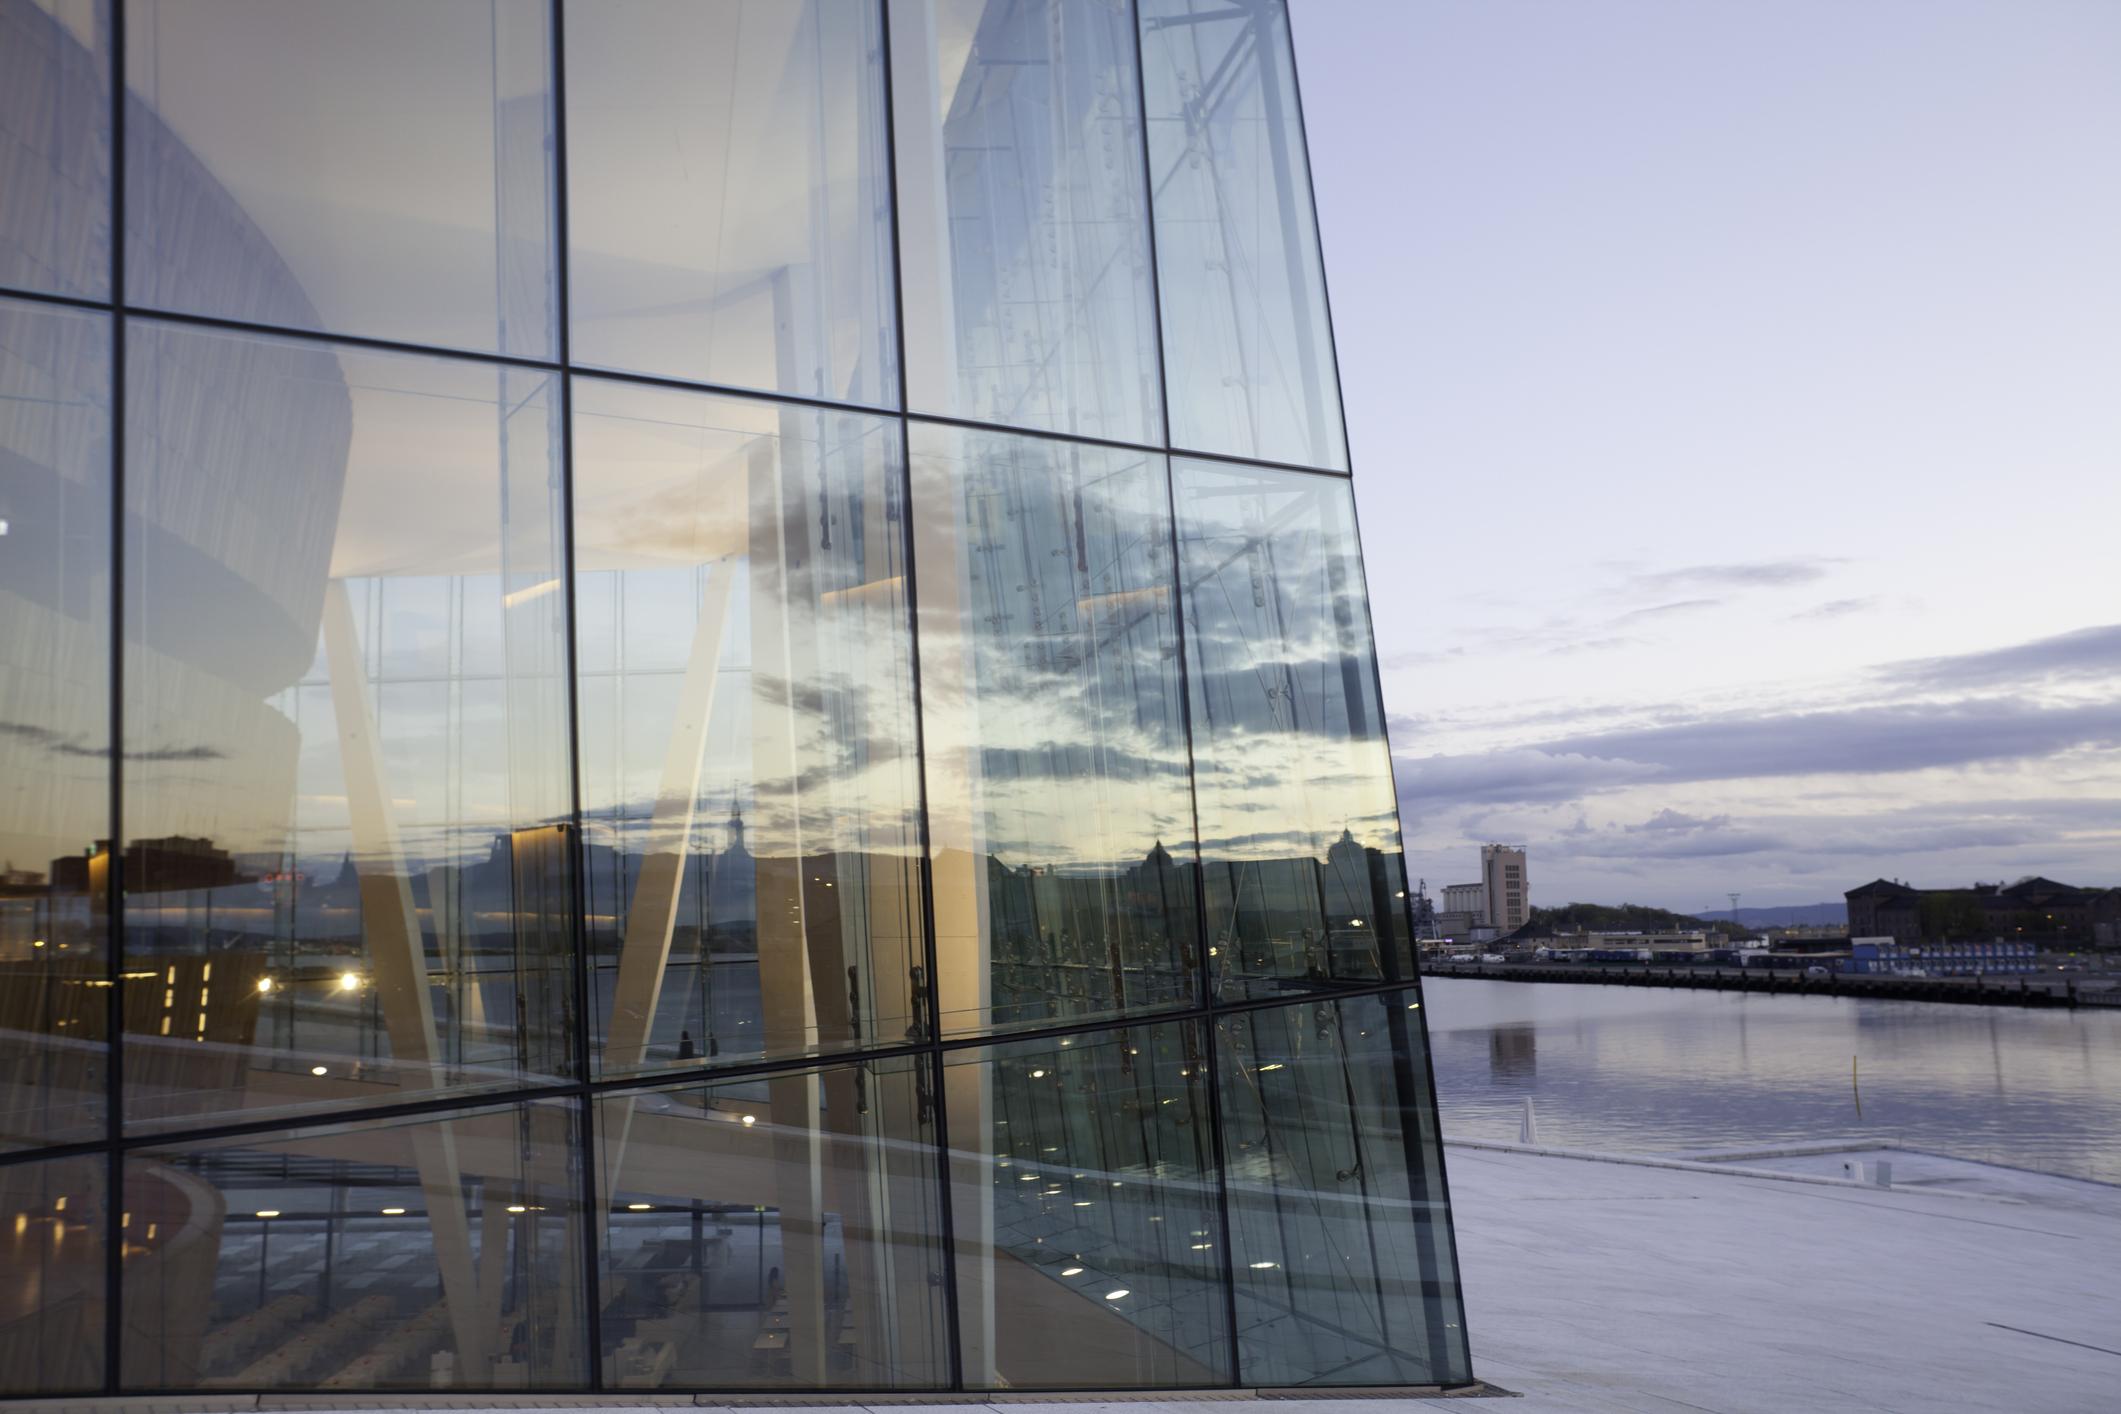 Oslo Opera House seen at dusk